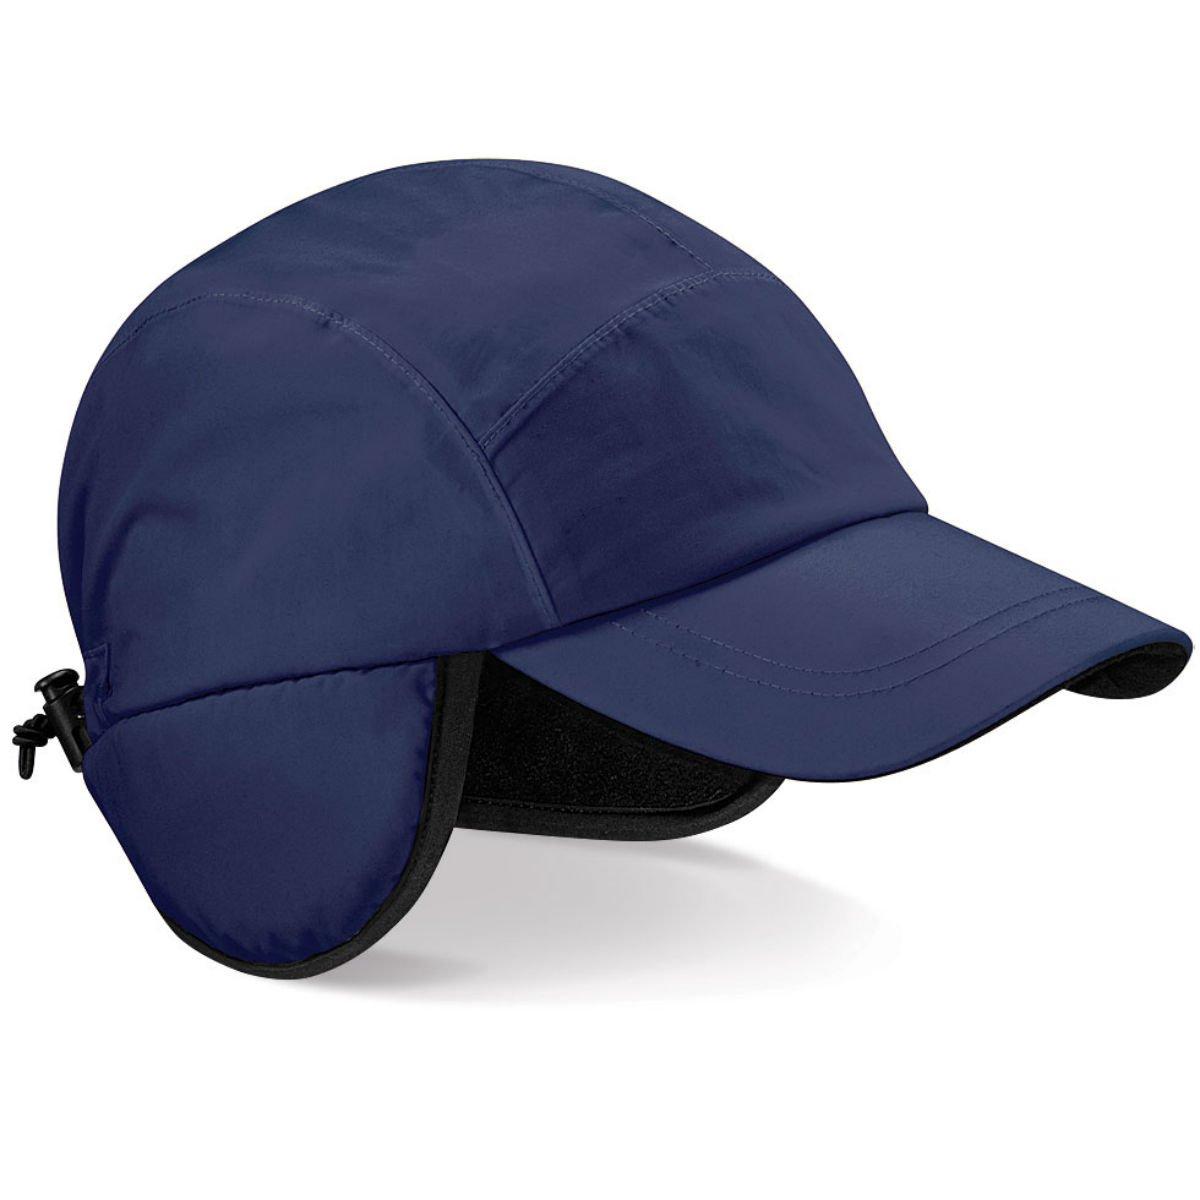 Beechfield Unisex Mountain Waterproof & Breathable Baseball Cap UTRW238_2